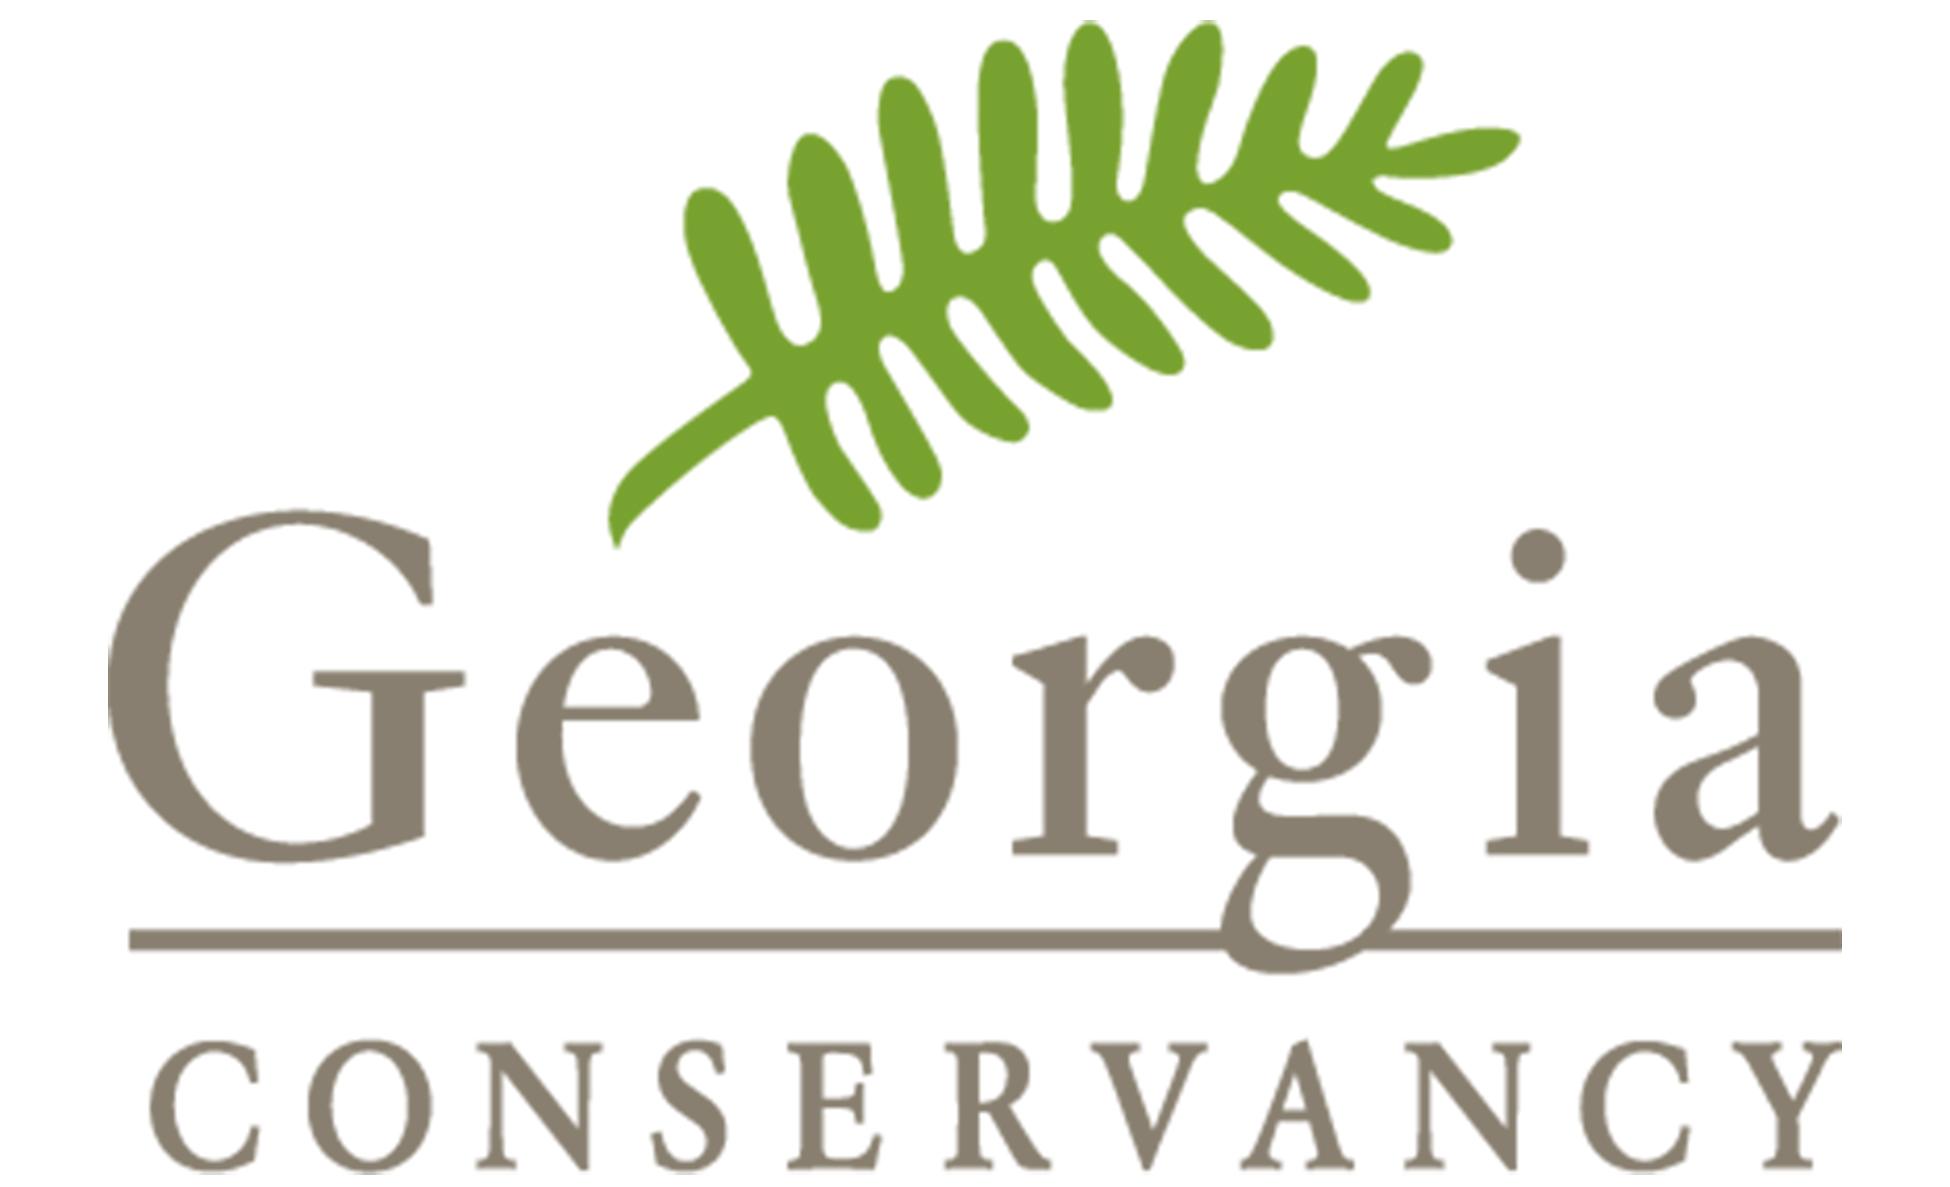 GC-logo copy.jpg